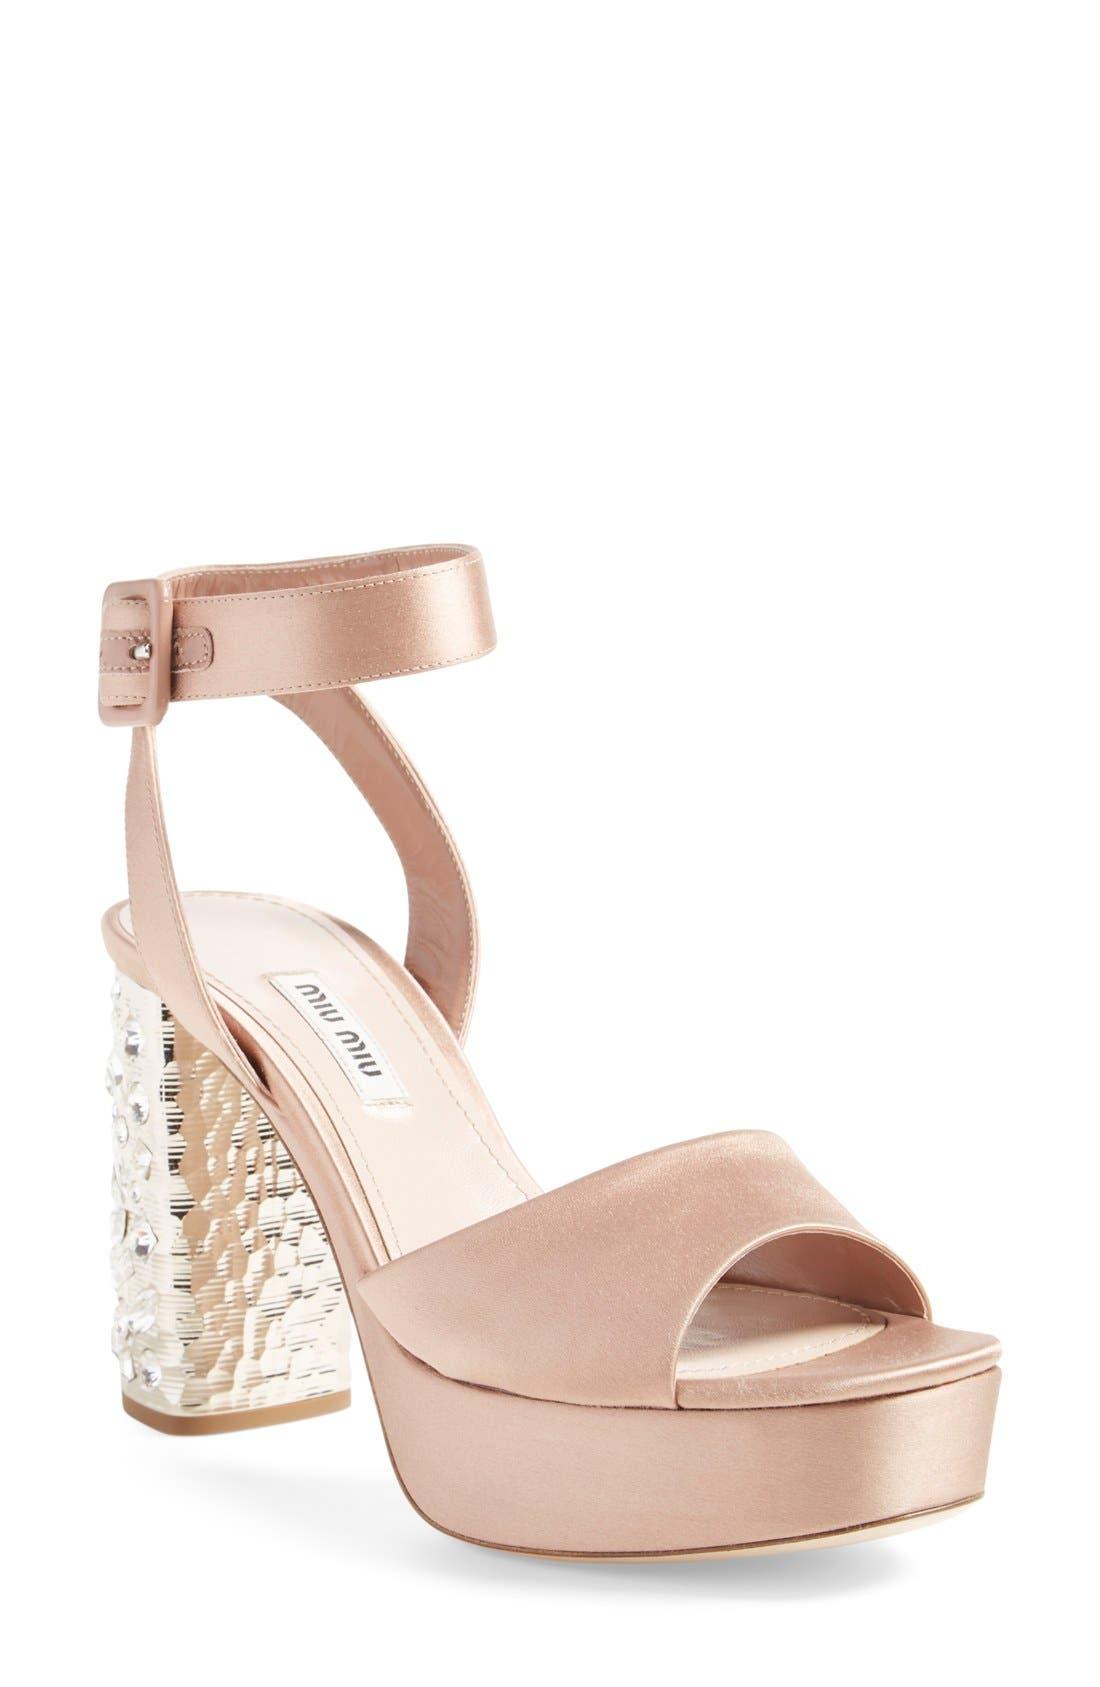 Studded Block Heel Platform Sandal,                         Main,                         color, Nude Suede